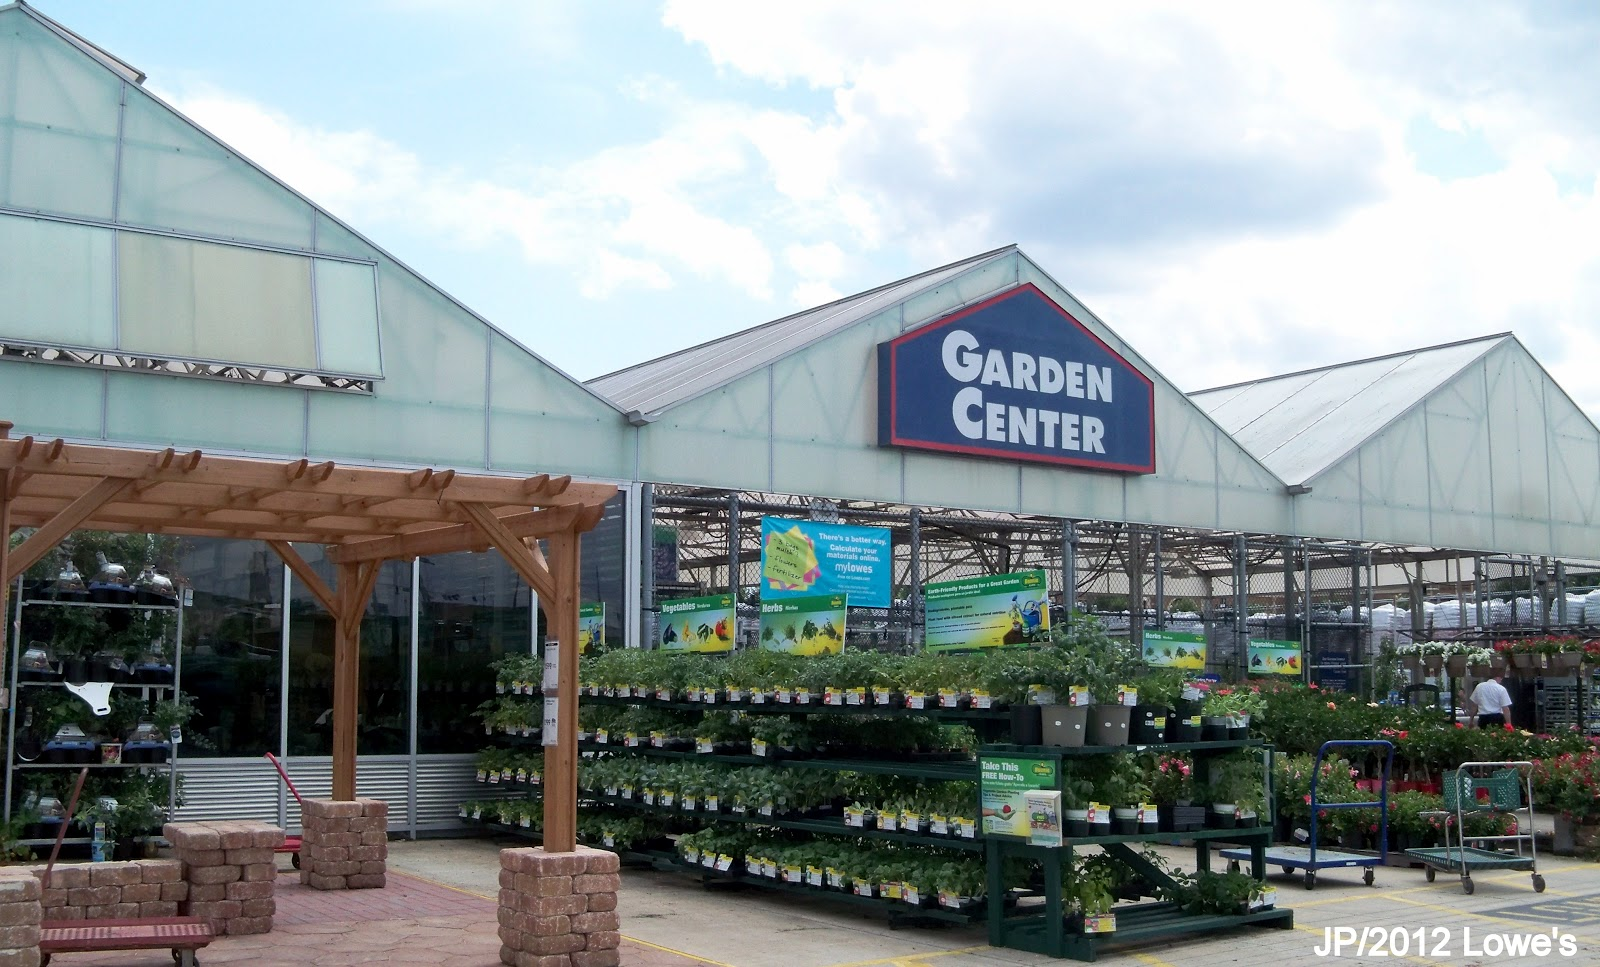 Garden Centre: MACON GEORGIA Attorney College Restaurant Dr.Hospital